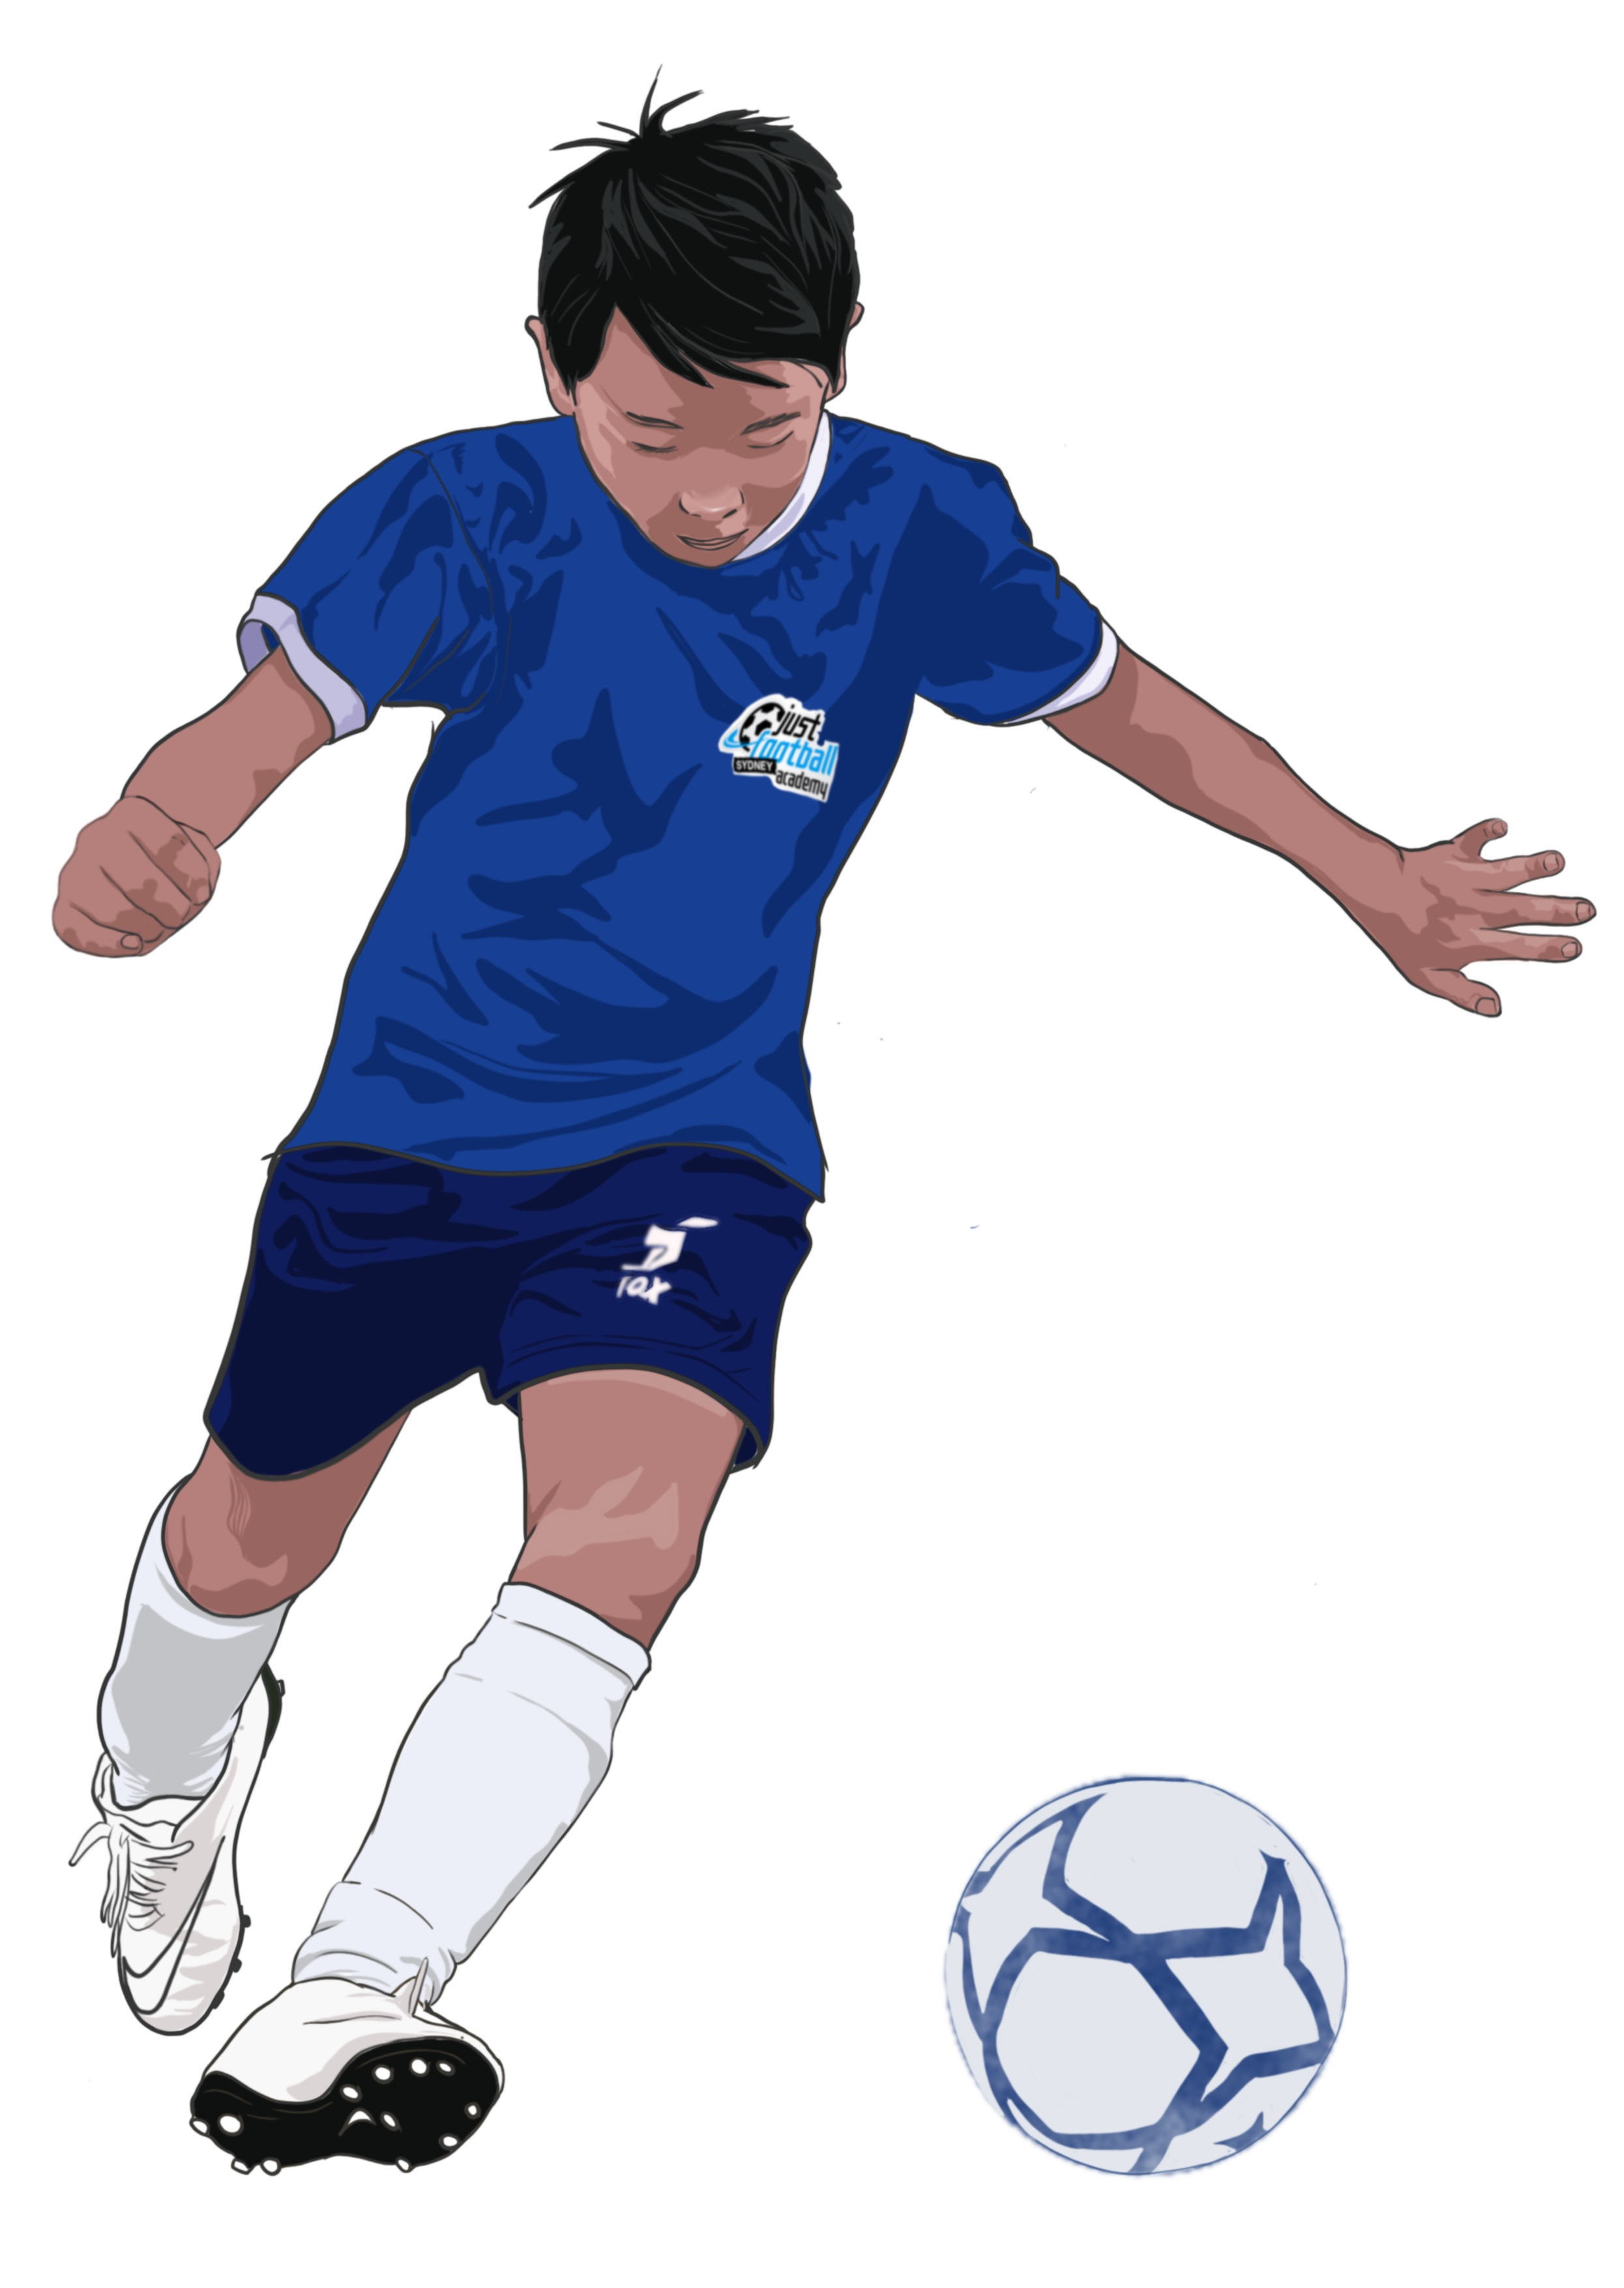 https://justfootballacademy.com.au/wp-content/uploads/2018/08/Photo-17-8-18-11-06-29-am-2.jpg